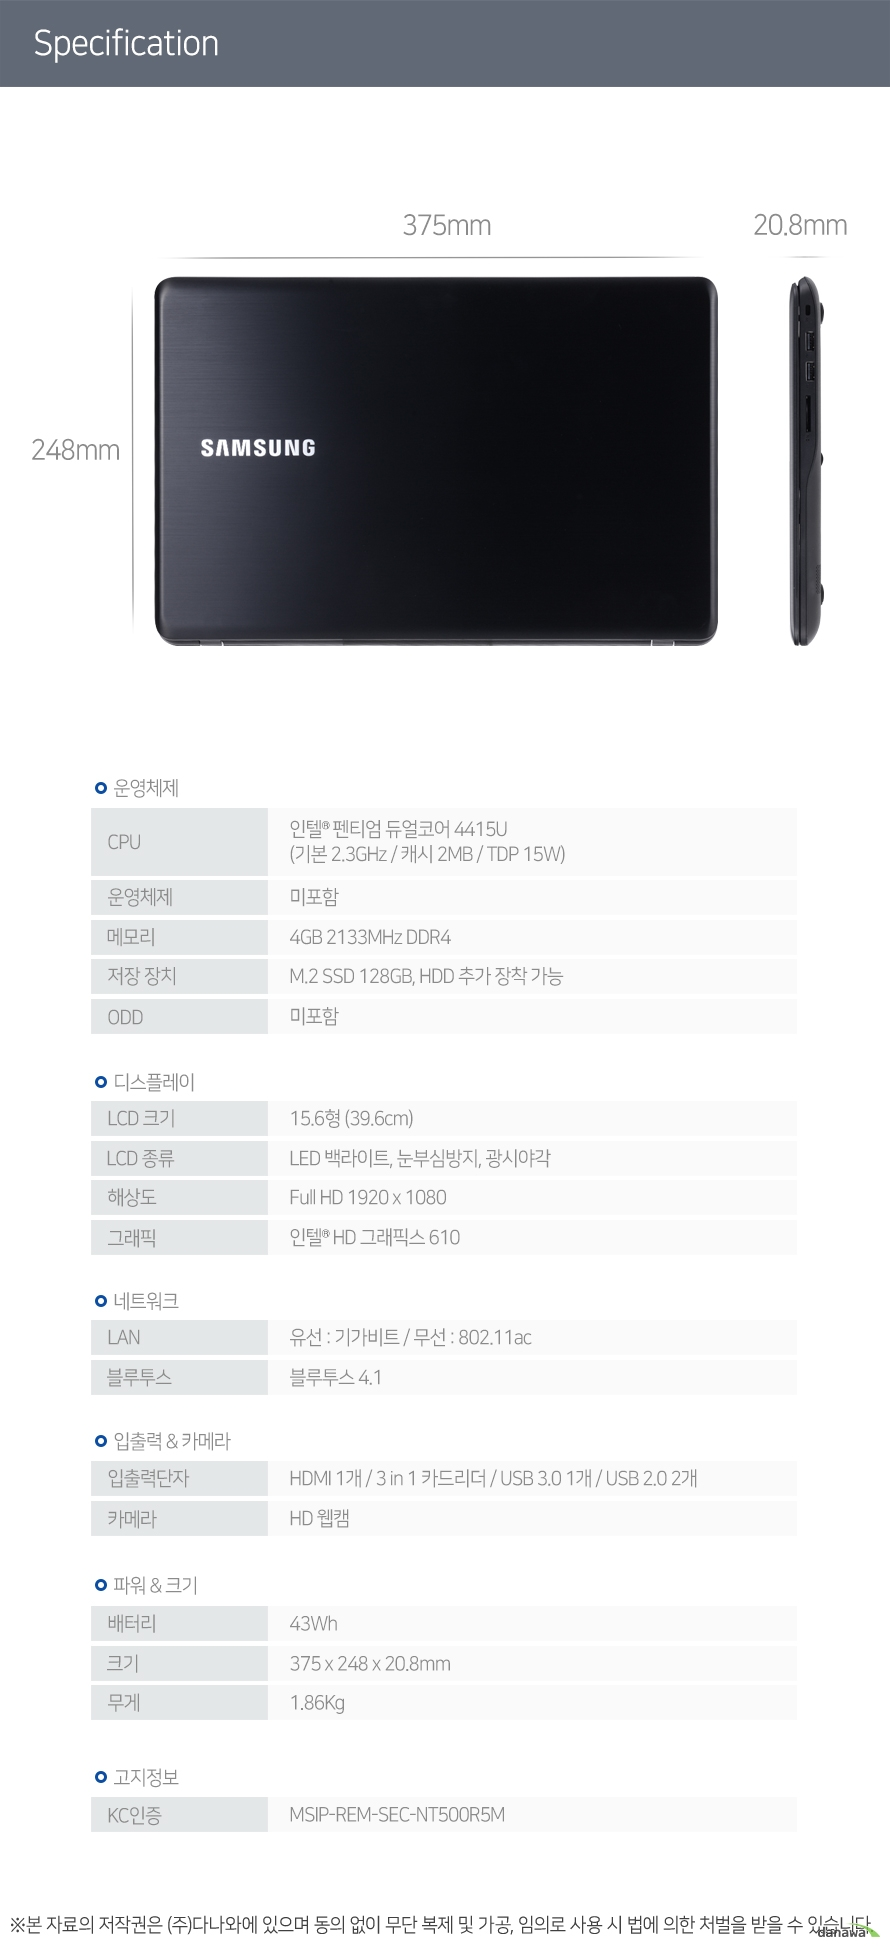 CPU 인텔 펜티엄 듀얼코어 4415U (기본 2.3GHz / 캐시 2MB / TDP 15W) 운영체제 미포함 메모리 4GB 2133MHz DDR4 저장 장치 M.2 SSD 128GB, HDD 추가 장착 가능 ODD 미포함 LCD 크기 15.6형 (39.6cm) LCD 종류 LED 백라이트, 눈부심방지, 광시야각 해상도 Full HD 1920 x 1080 그래픽 인텔 HD 그래픽스 610 LAN 유선 : 기가비트 / 무선 : 802.11ac 블루투스 블루투스 4.1 입출력단자 HDMI 1개 / 3 in 1 카드리더 / USB 3.0 1개 / USB 2.0 2개 카메라 HD 웹캠 배터리 43Wh 크기 375 x 248 x 20.8mm 무게 1.86Kg KC인증 MSIP-REM-SEC-NT500R5M